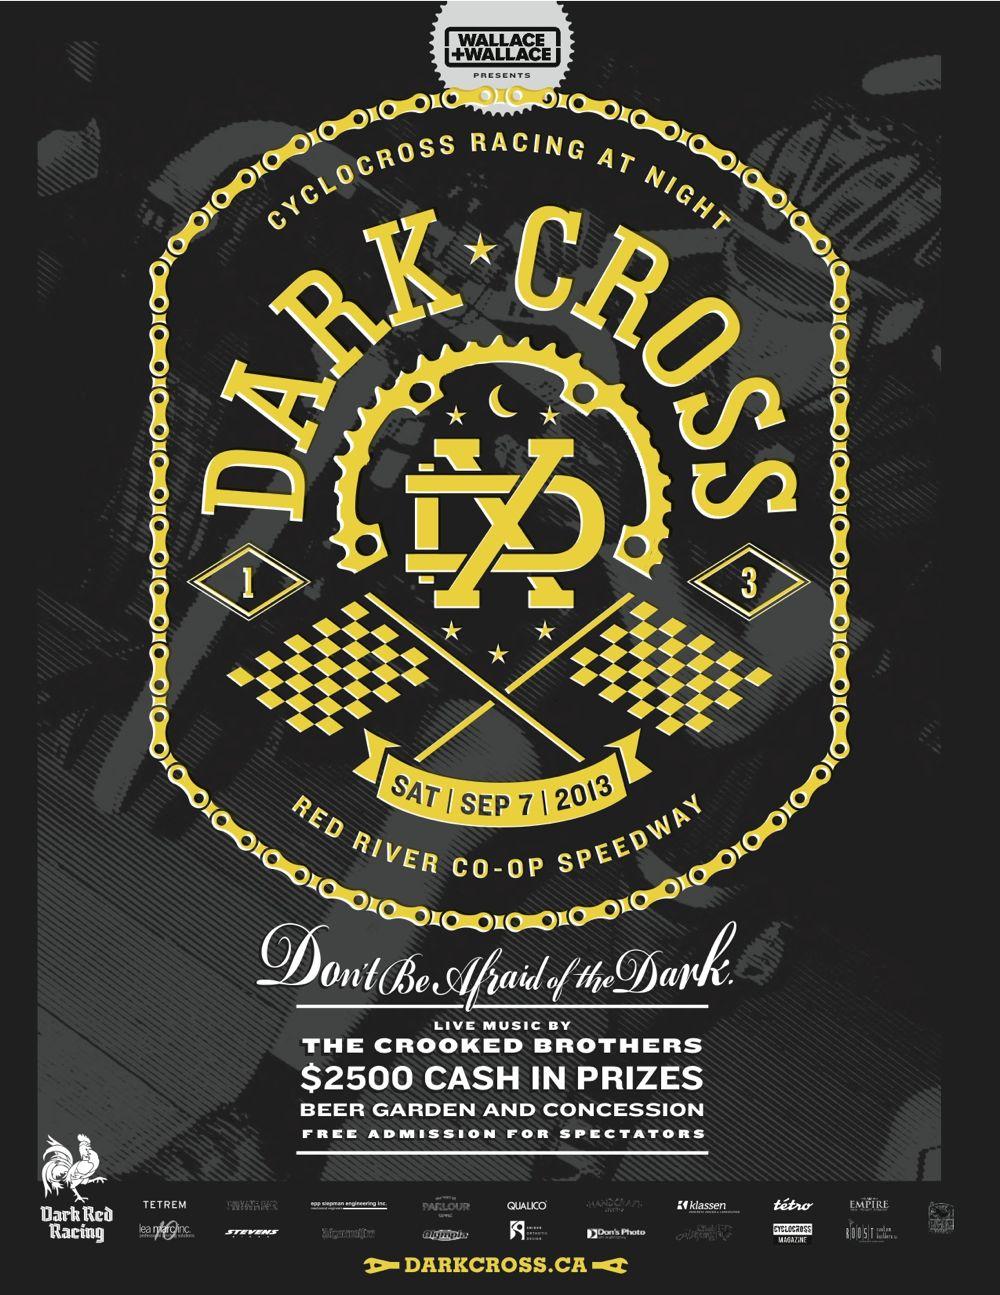 DDR_Dark Cross Poster_8.5x11_2013_01